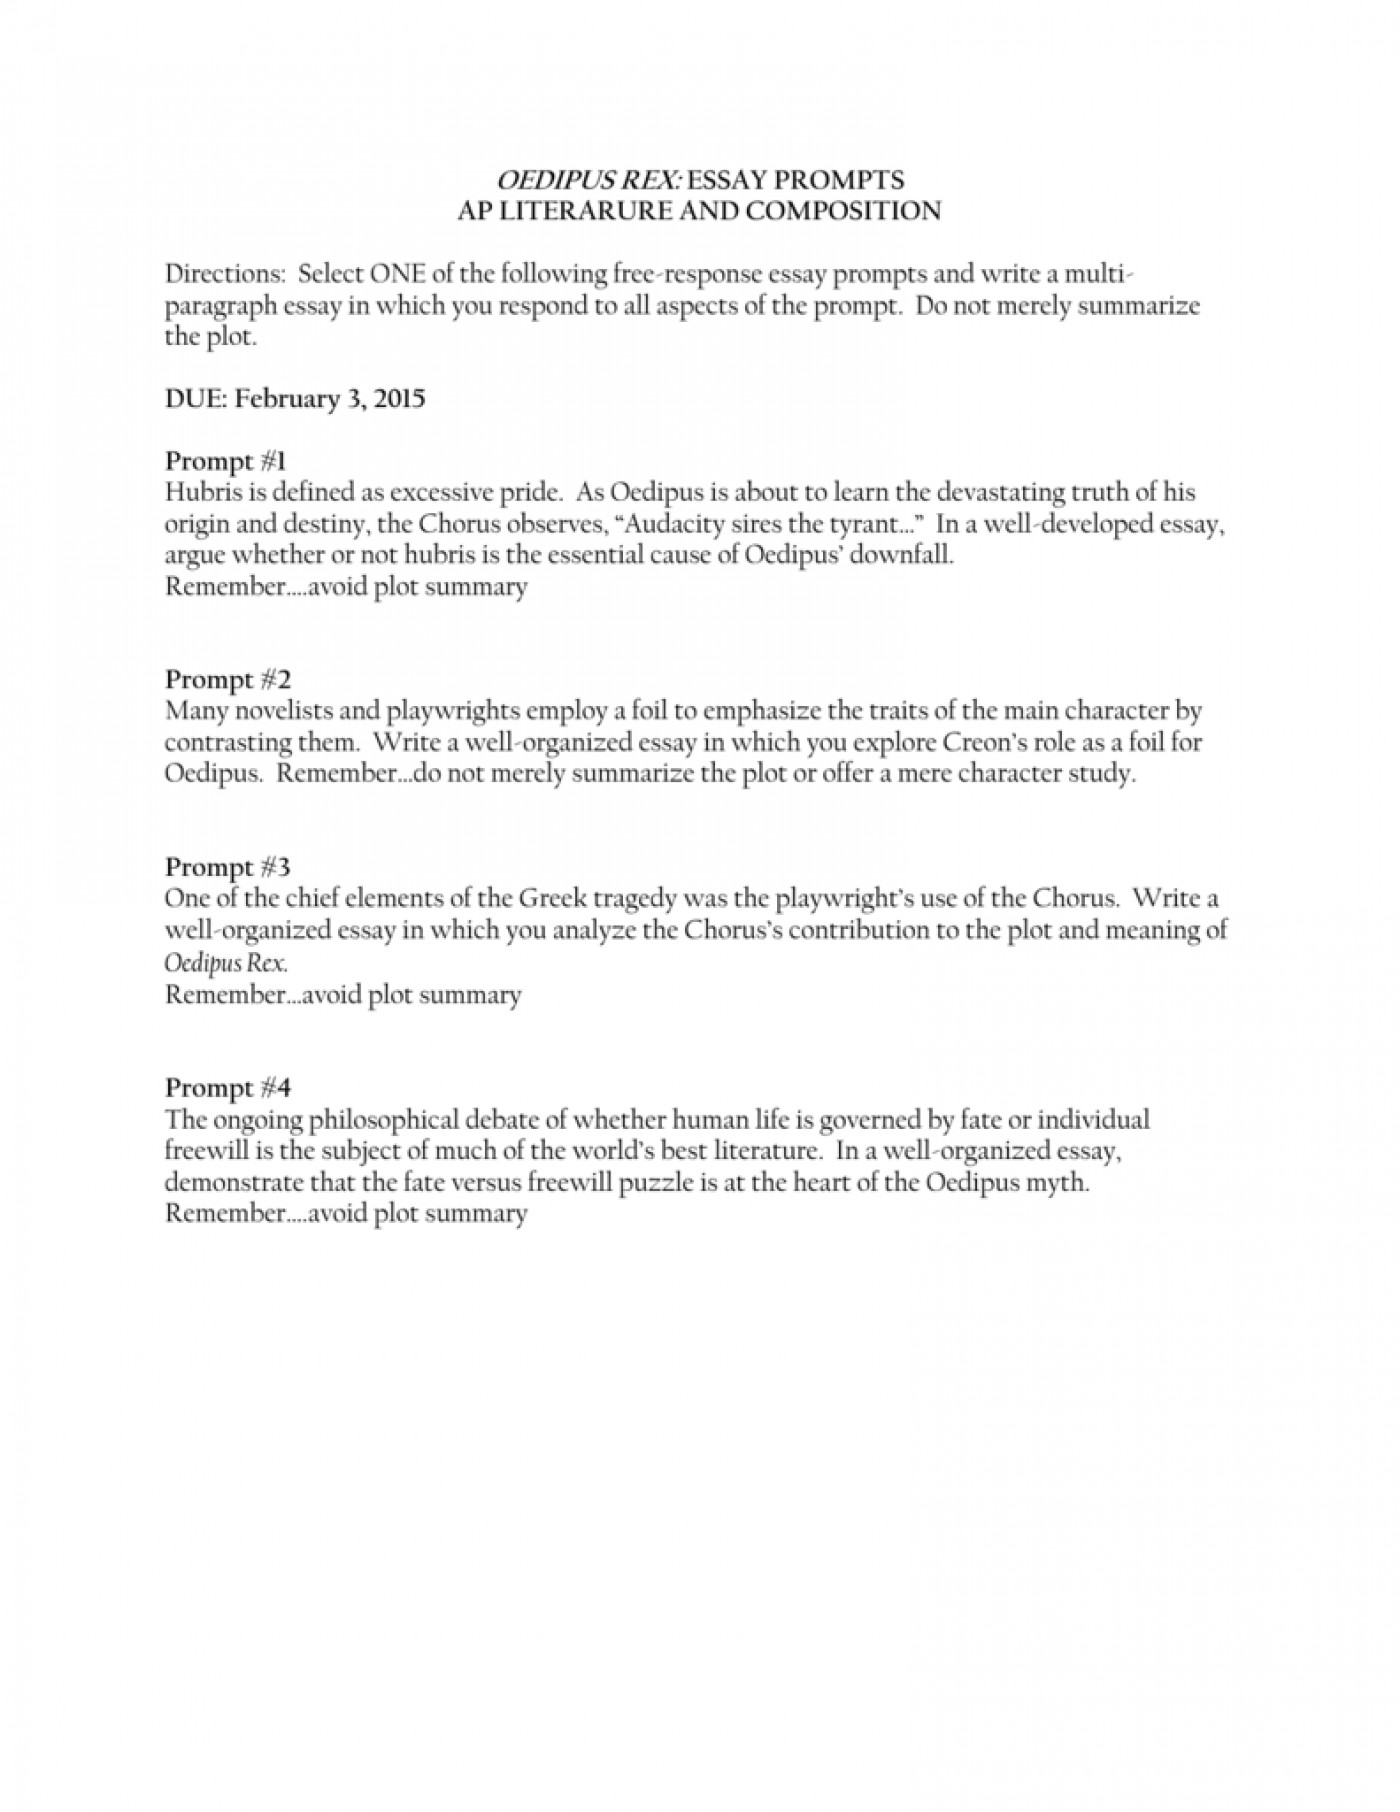 oedipus rex pride essay